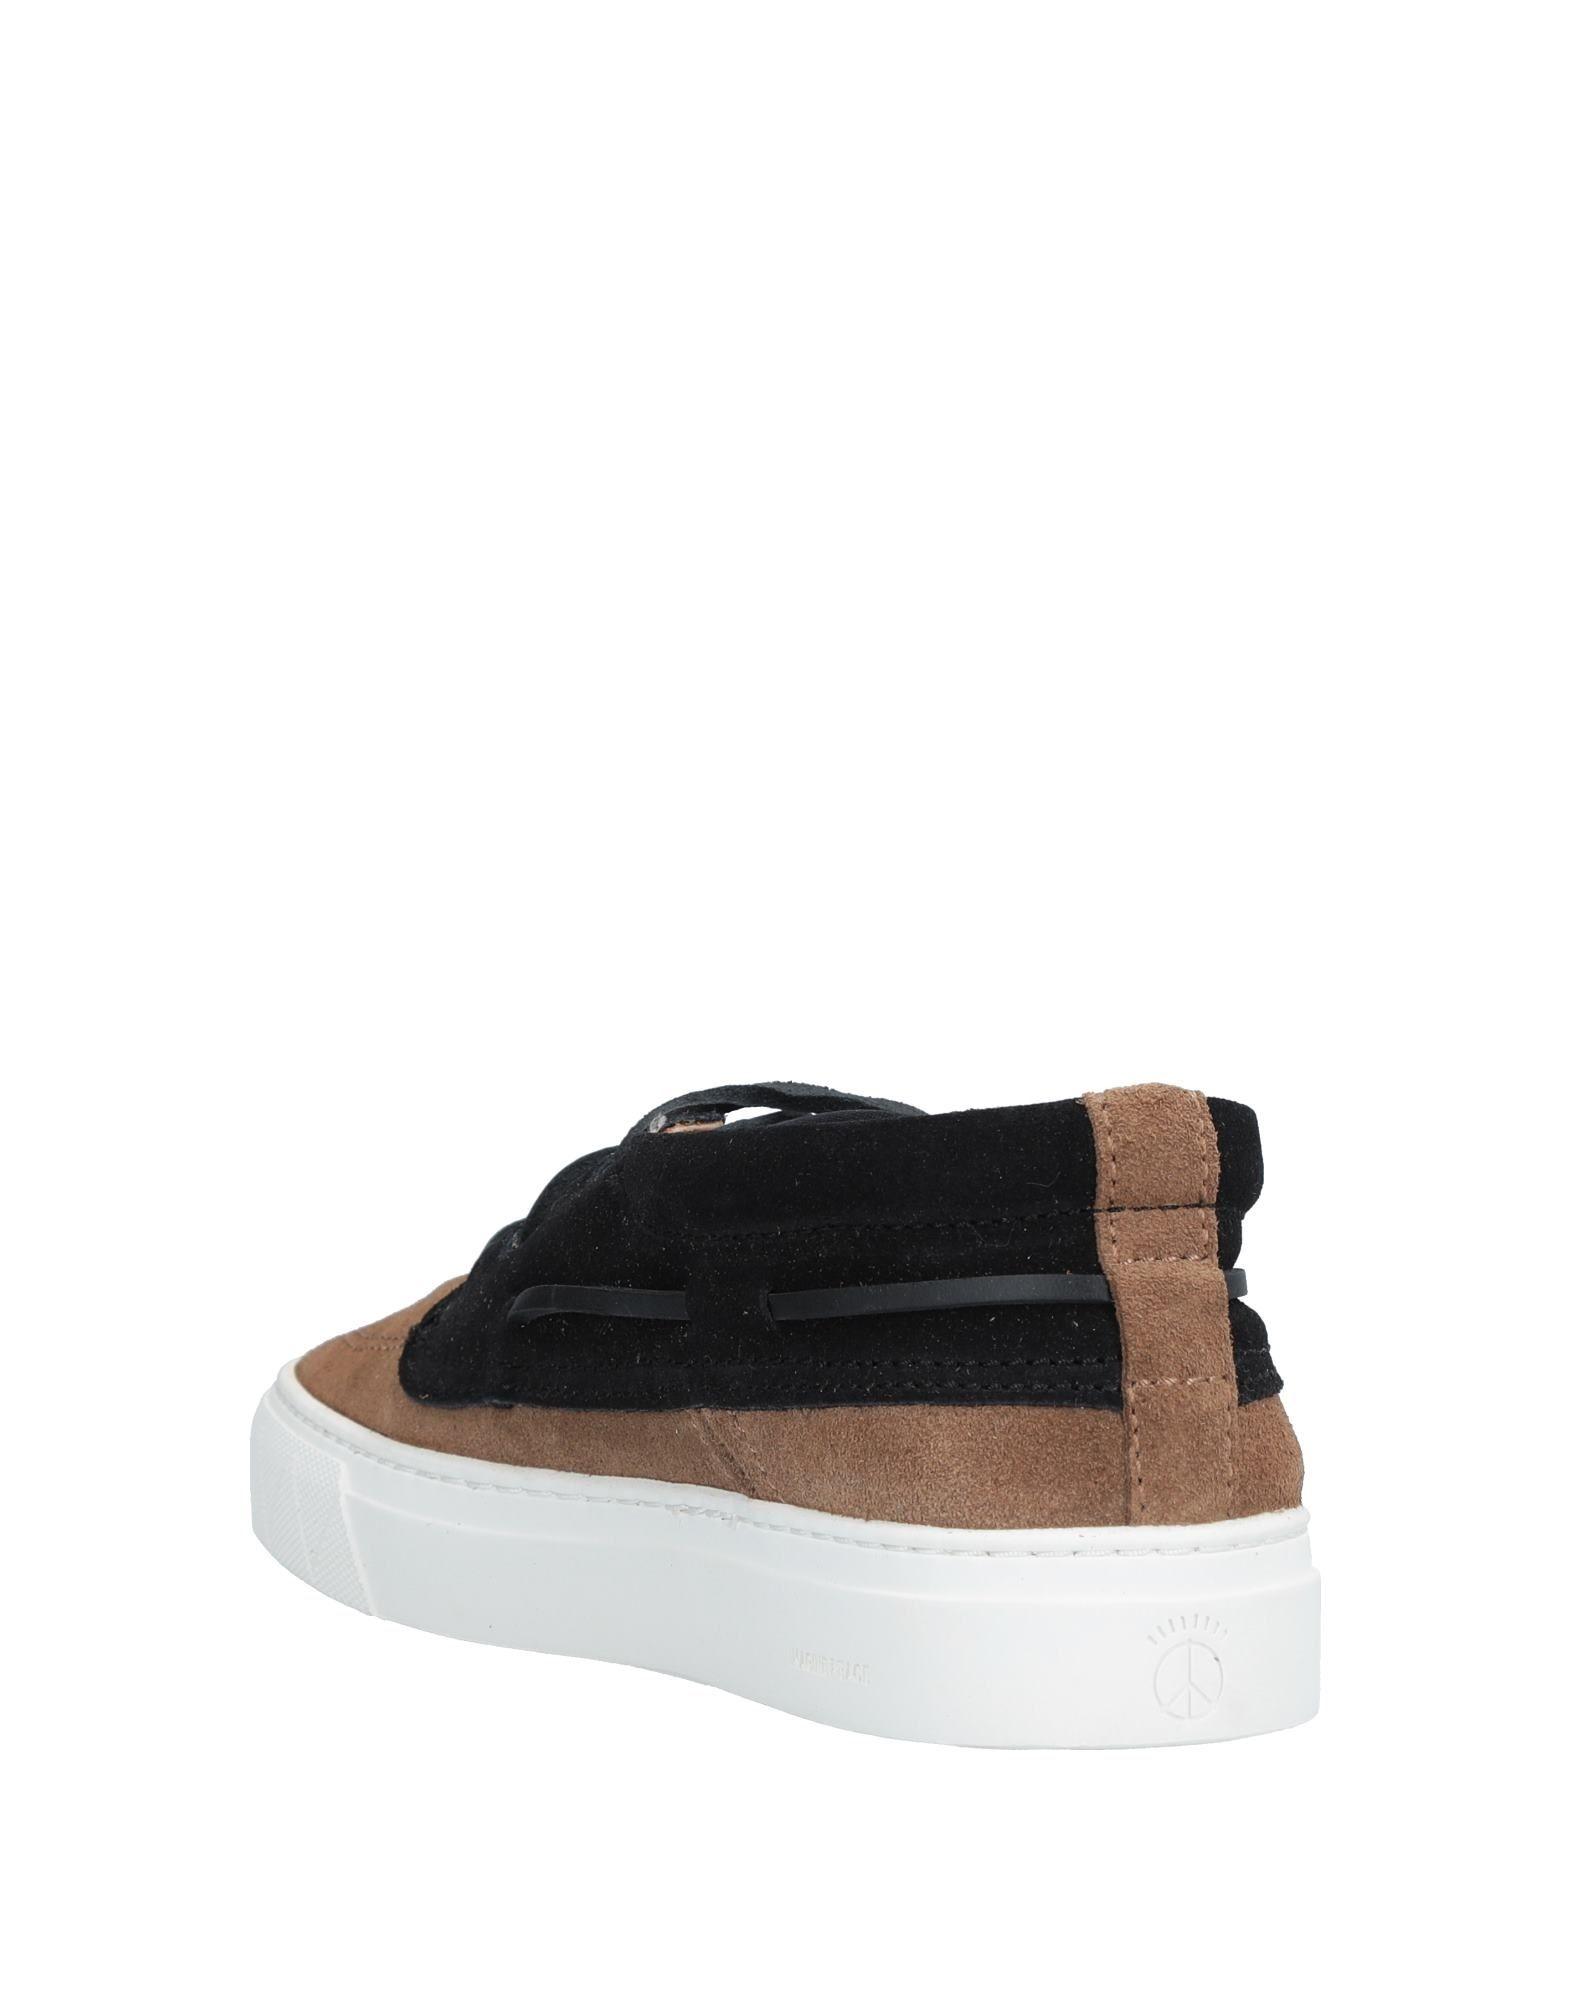 Dolfie Schnürschuhe Damen  Schuhe 11529010HP Gute Qualität beliebte Schuhe  6d333c